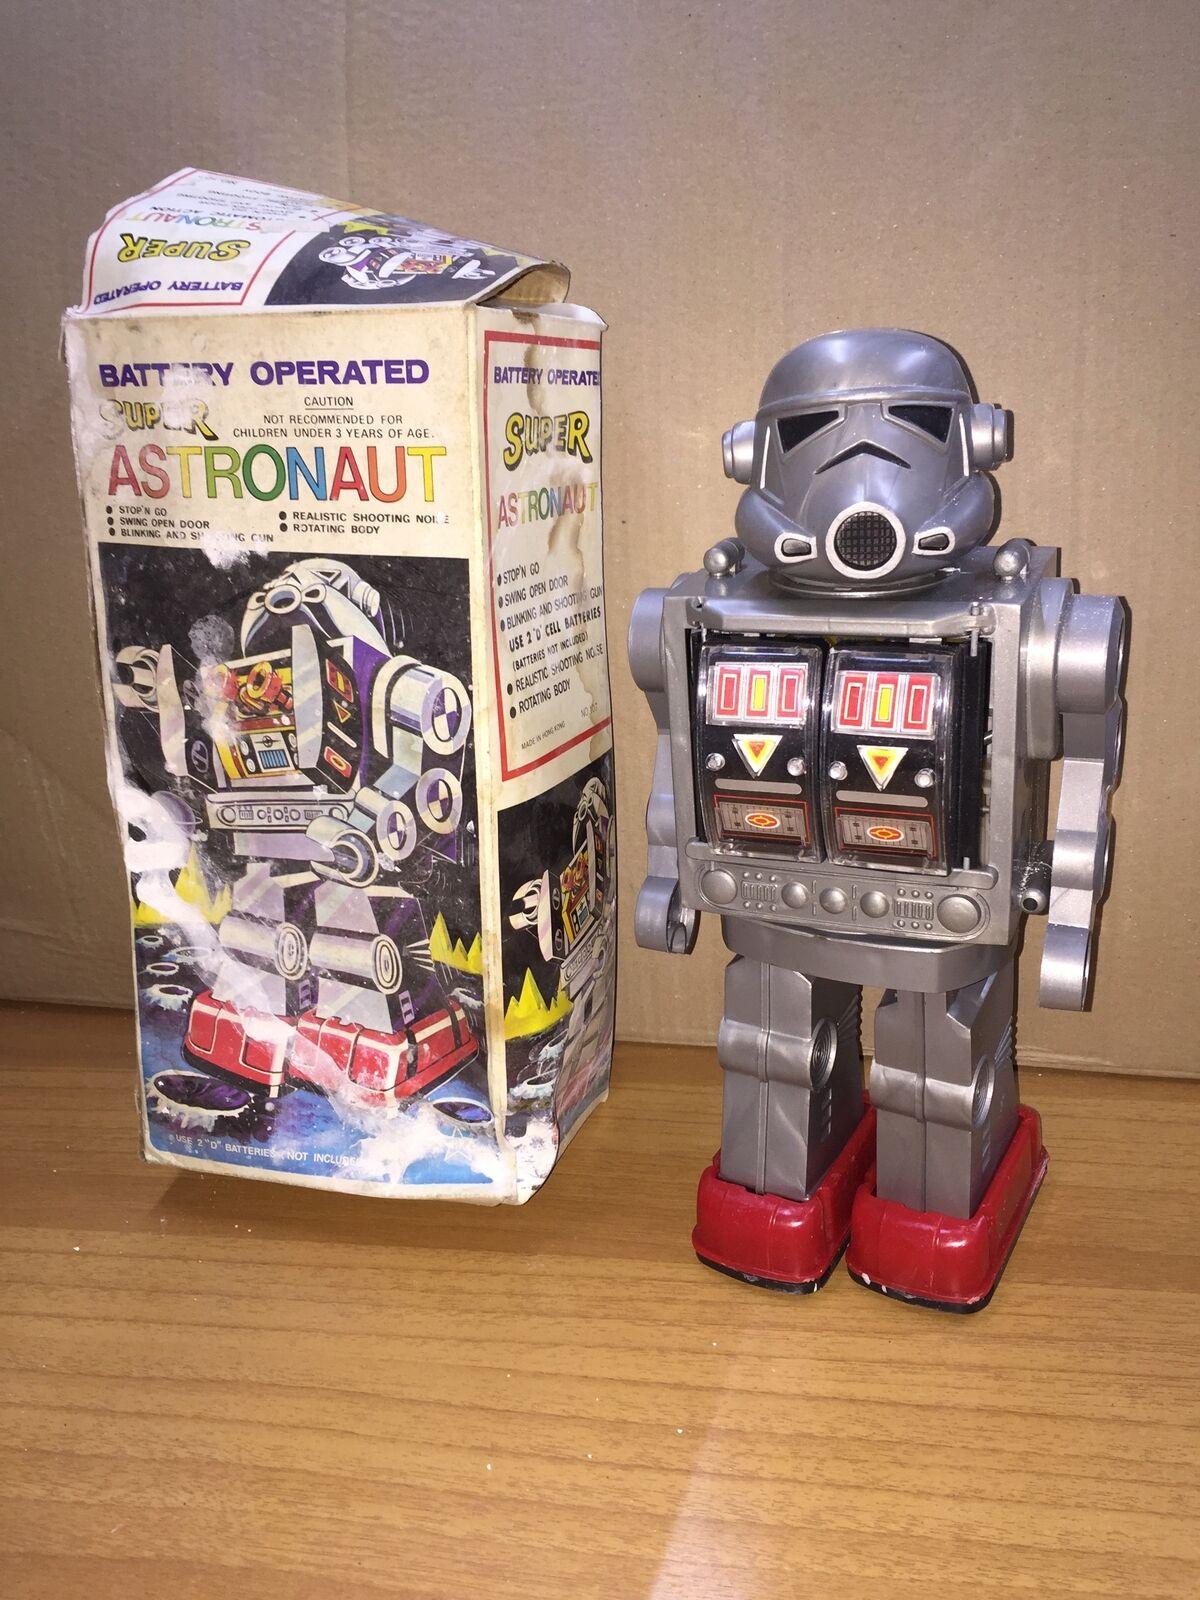 fino al 60% di sconto Battery Operated SUPER ASTRONAUT ROBOT 30 cm in Scatolo Vintage Vintage Vintage  nuovo sadico